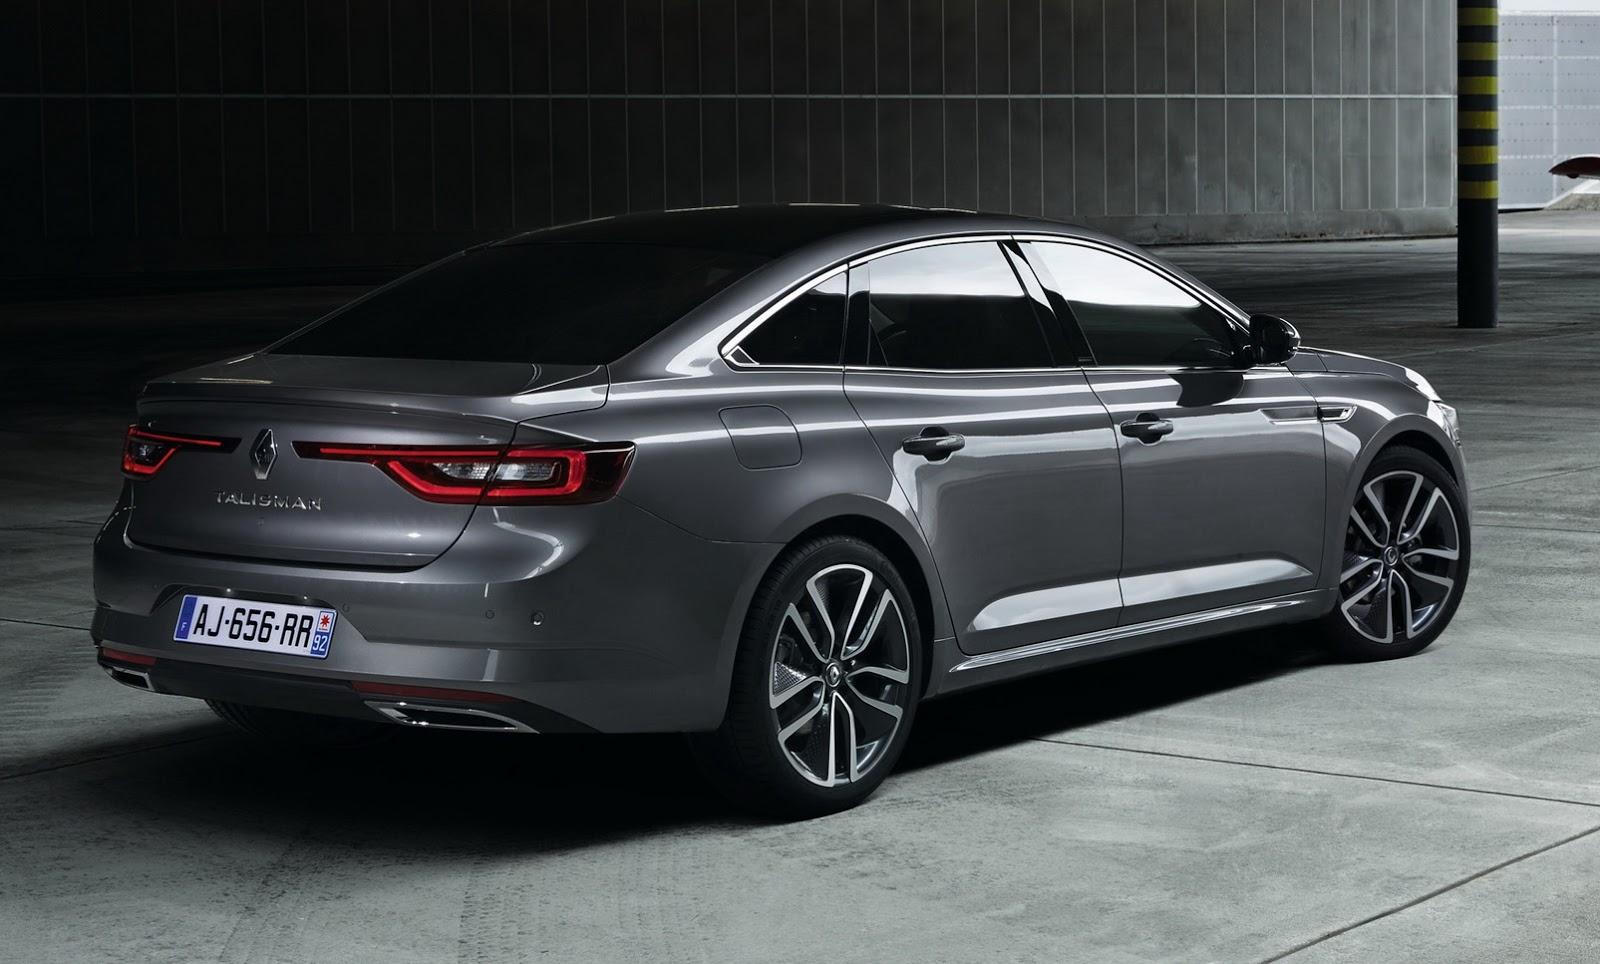 http://1.bp.blogspot.com/-1imqW9oOlpk/VZqDbxdMt8I/AAAAAAABCEg/p32hqQasiXc/s1600/New-Renault-Talisman-0002.jpg